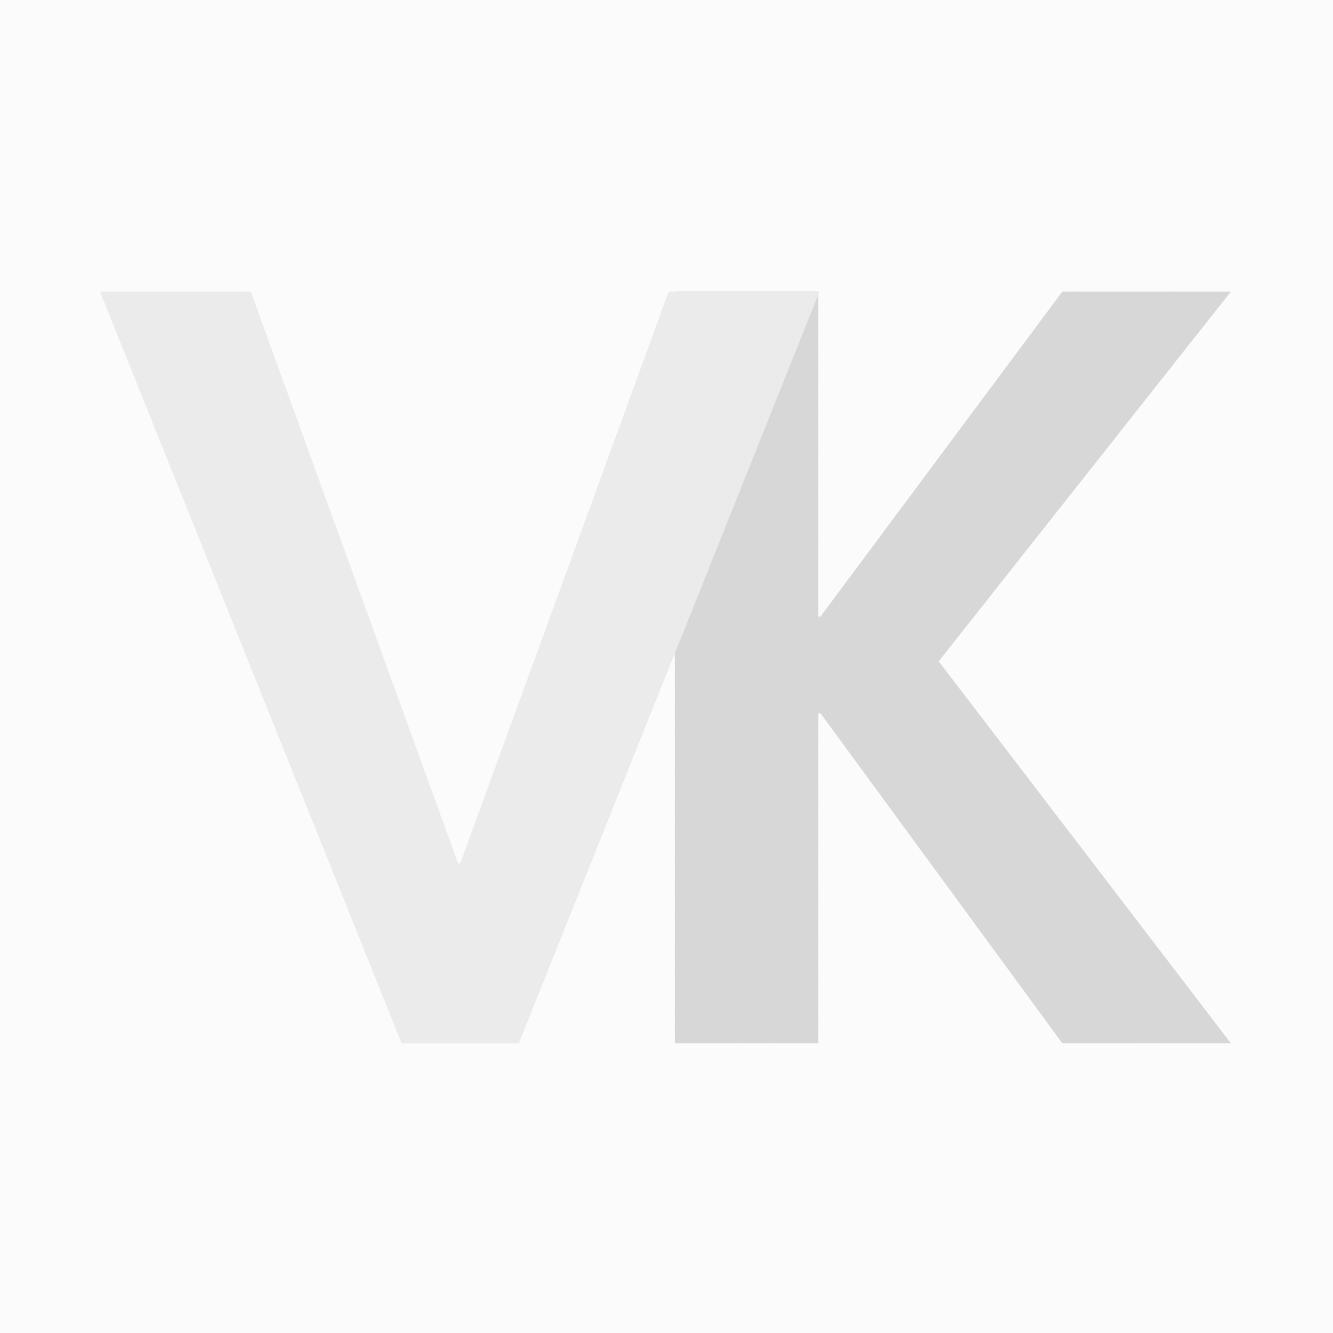 Krulborstel Hot 'n Style Brush 40mm